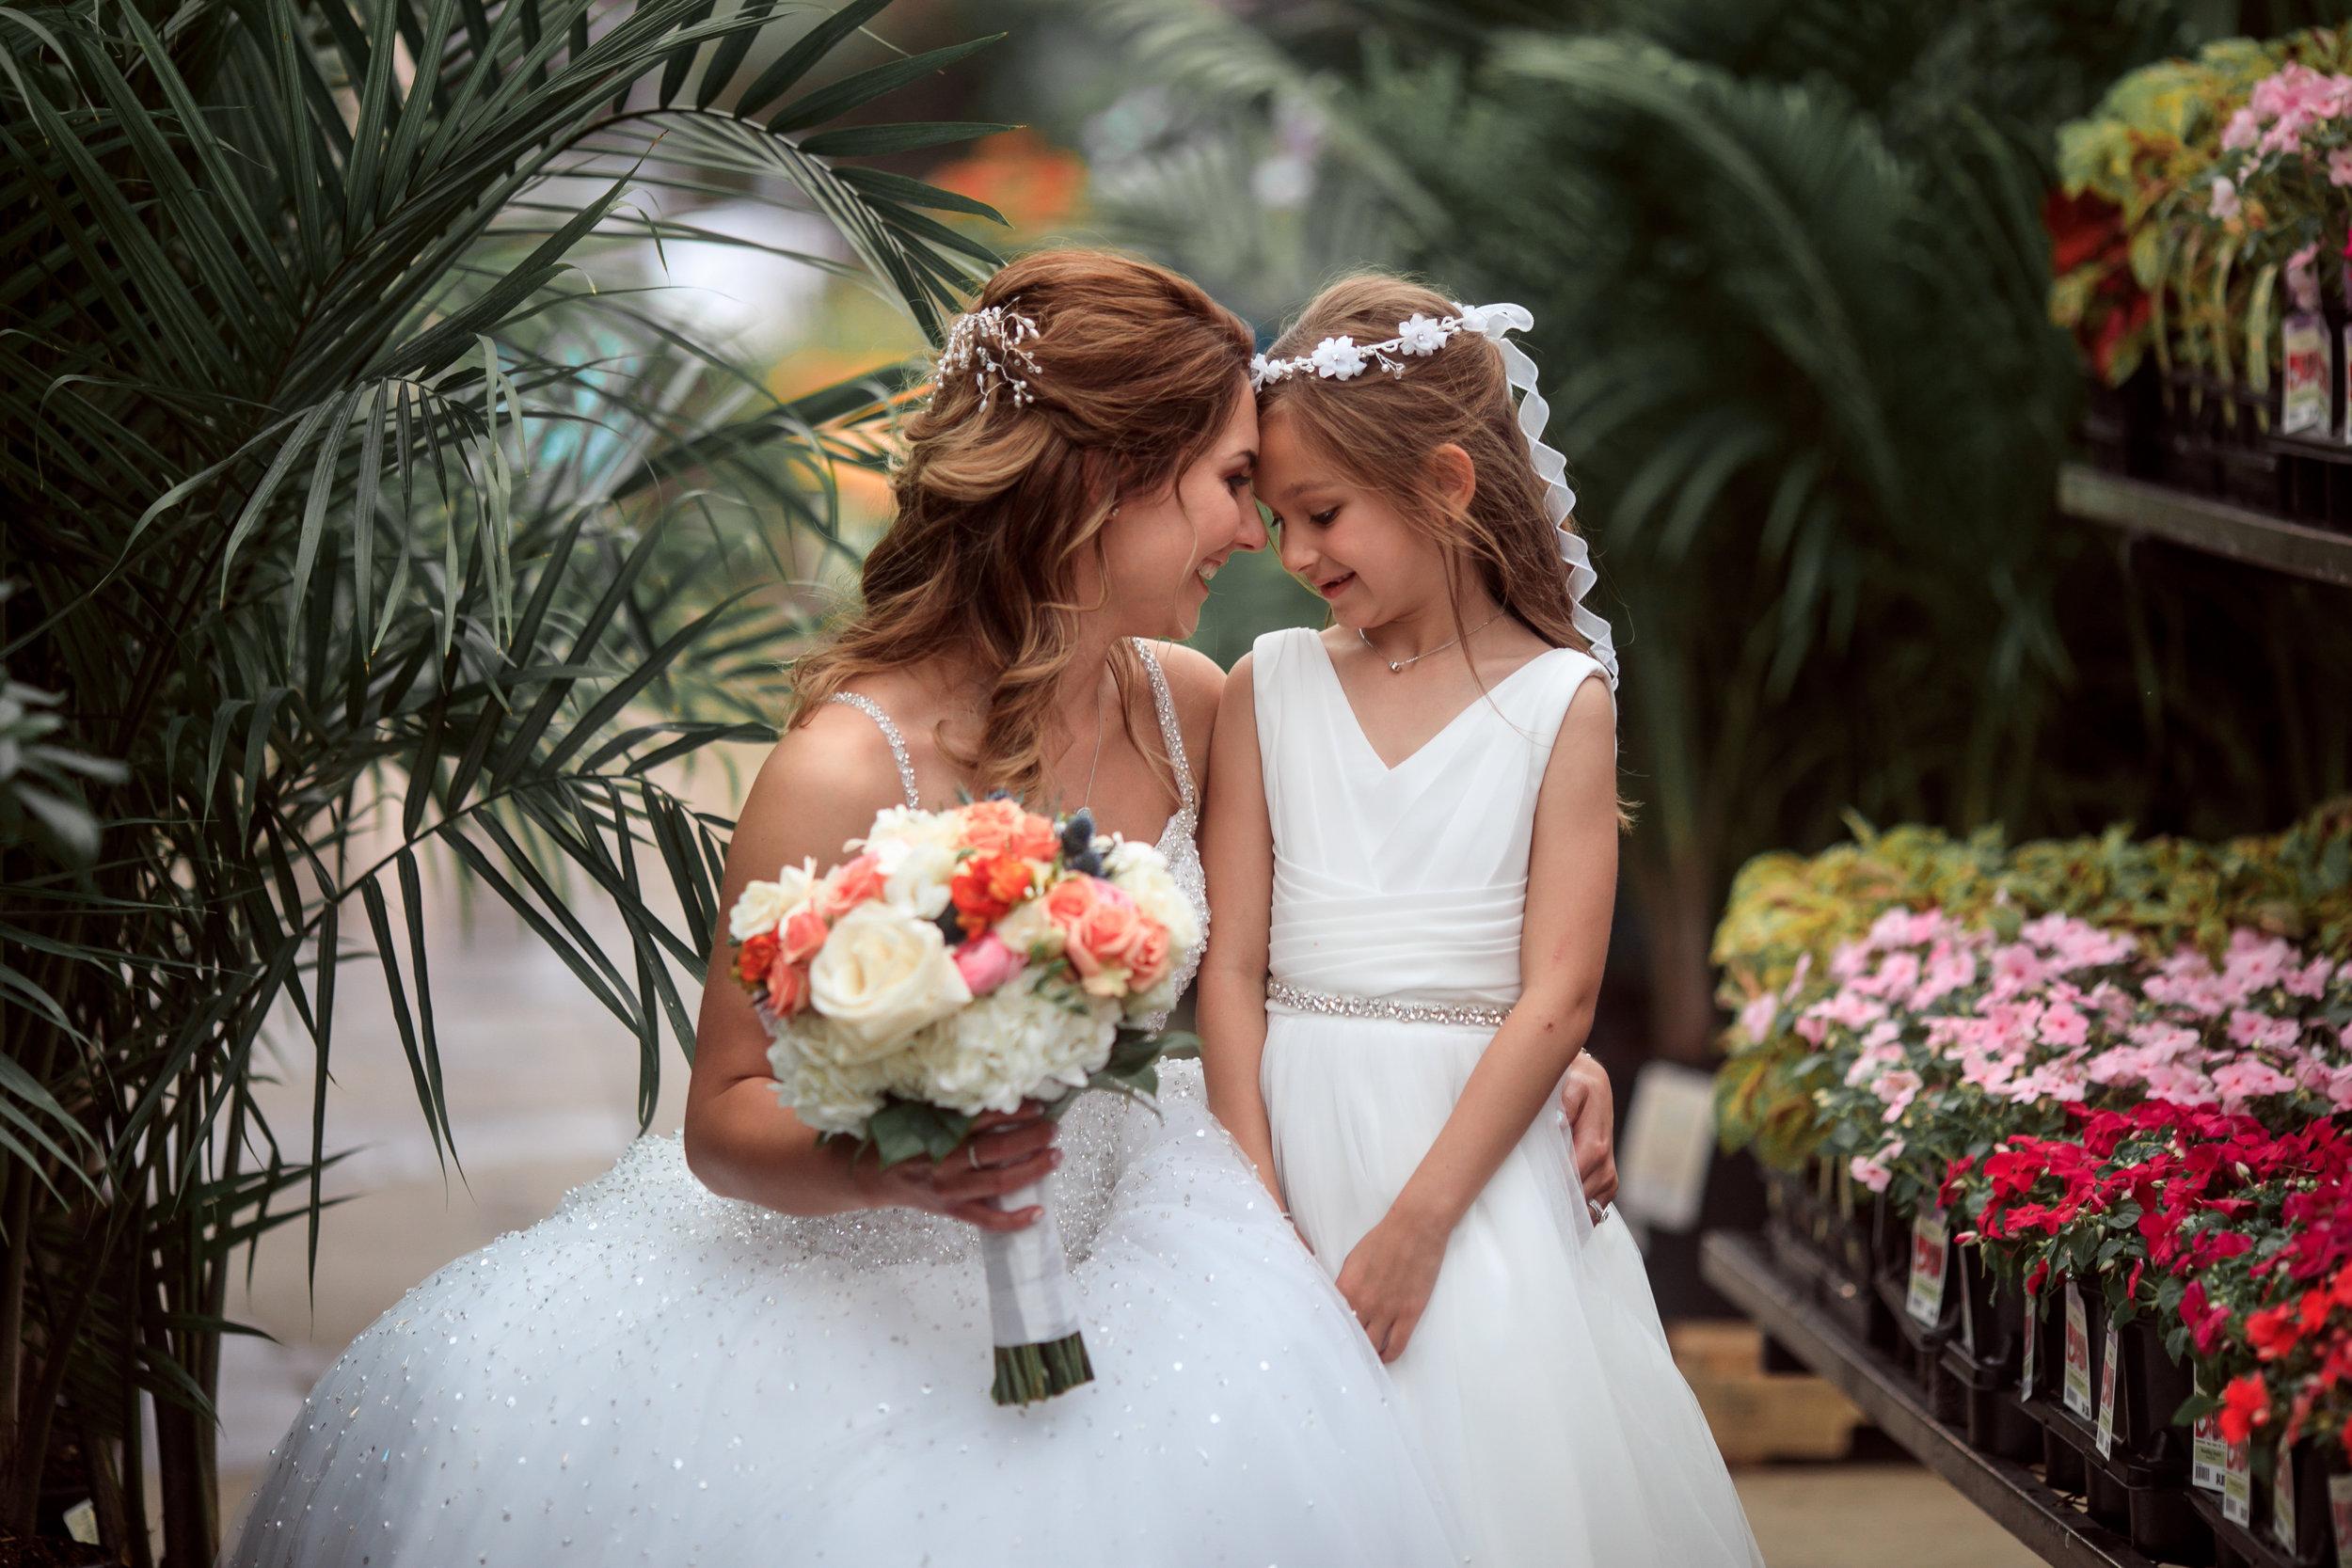 Wedding-couple-takes-photos-at-lowes-hardware-due-to-rain27.jpg